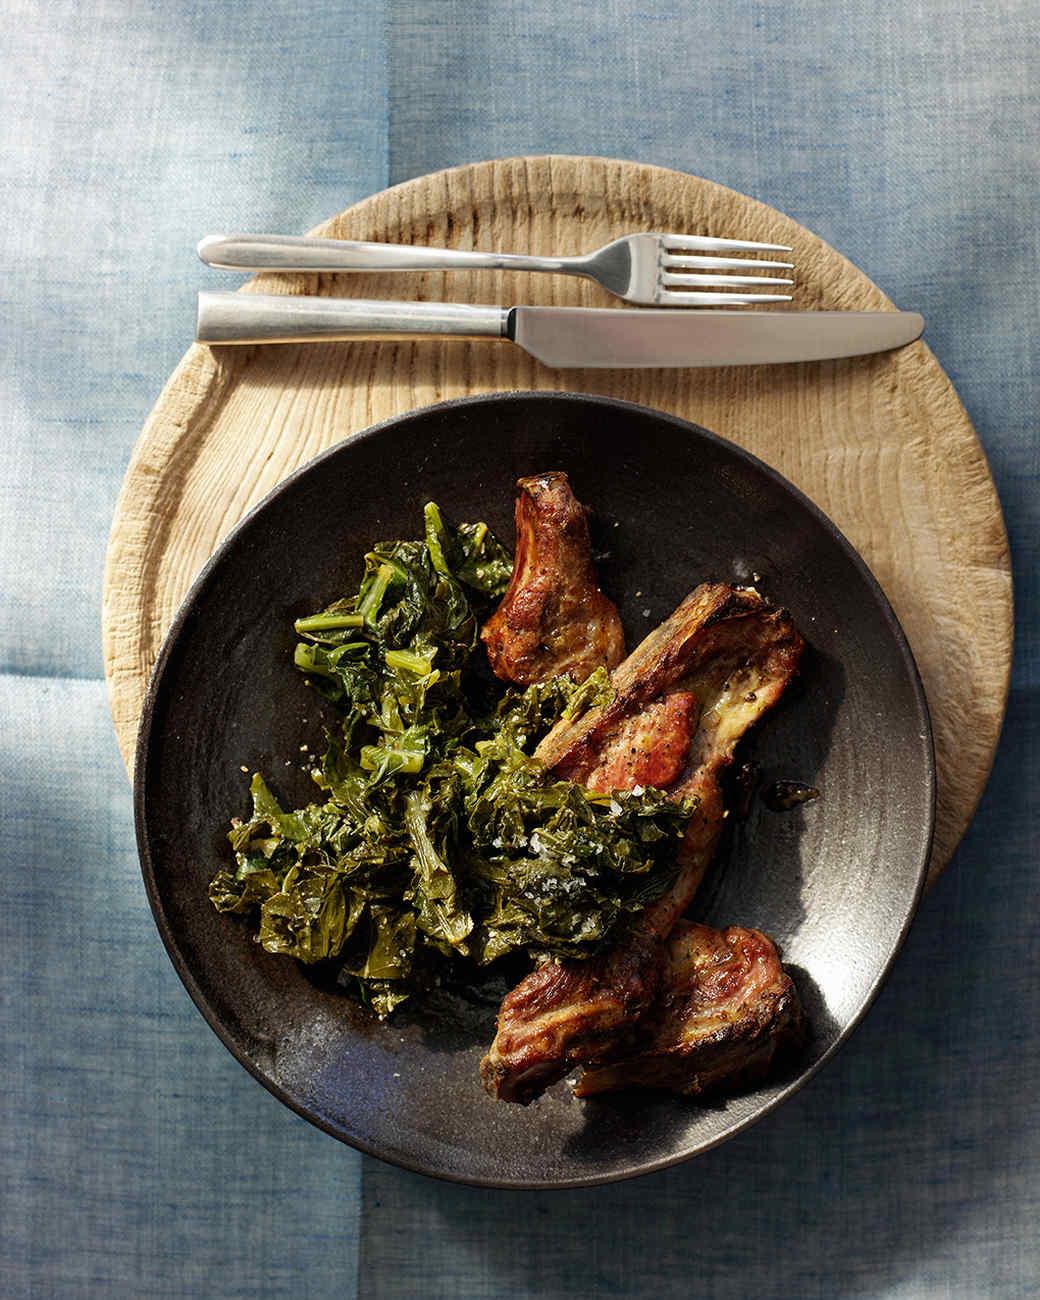 Garlicky Pork Ribs with Greens